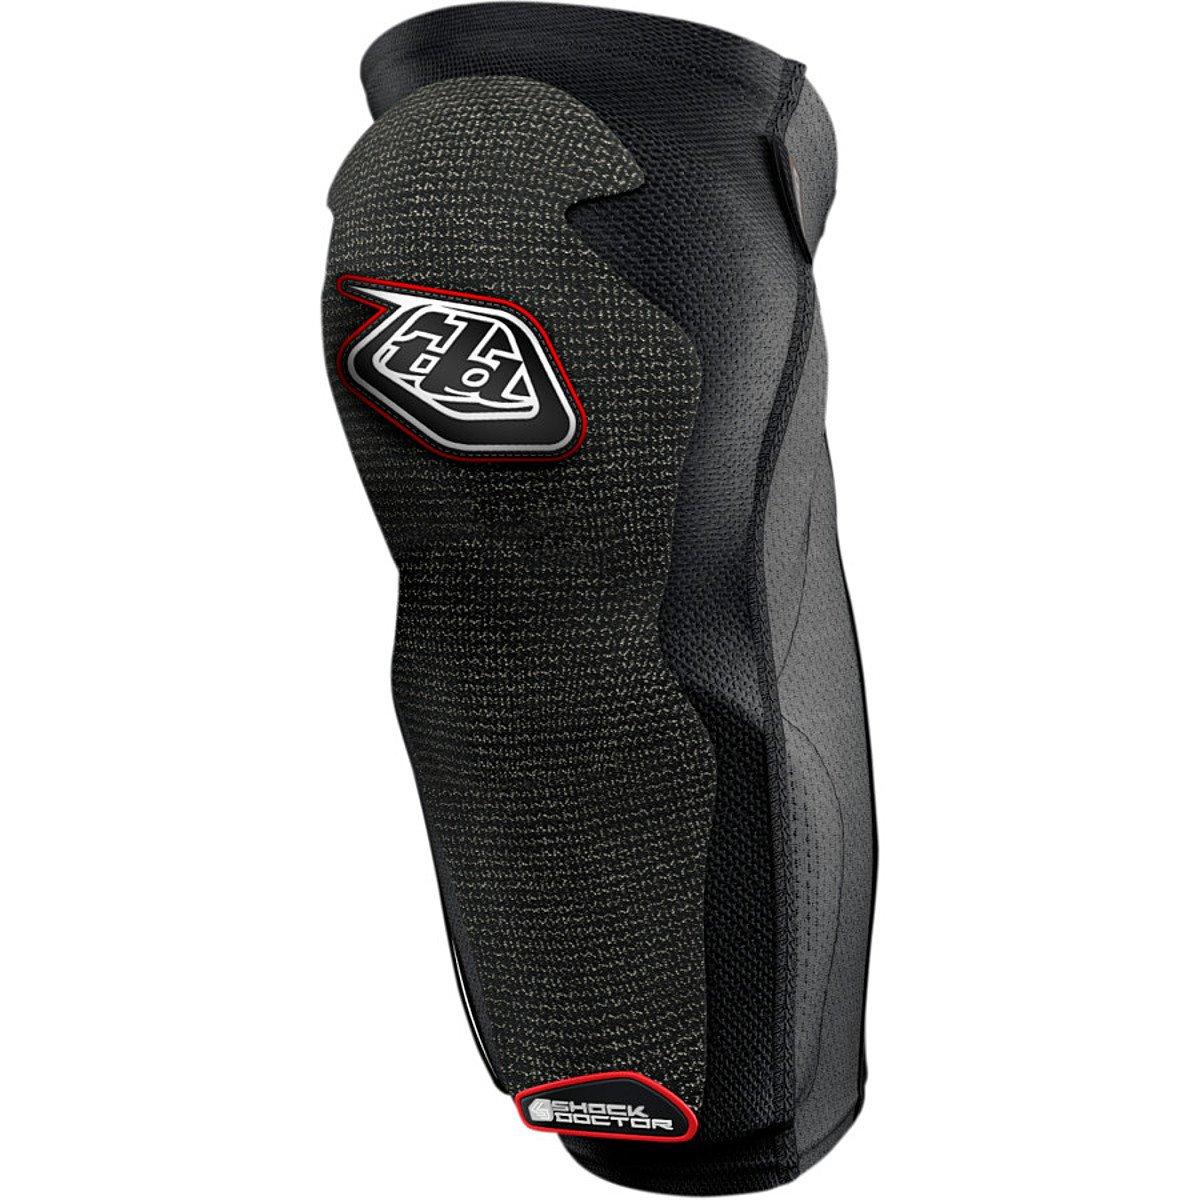 Troy Lee Designs KG 5450 Knee/Shin Guard Guard Solid Black, S